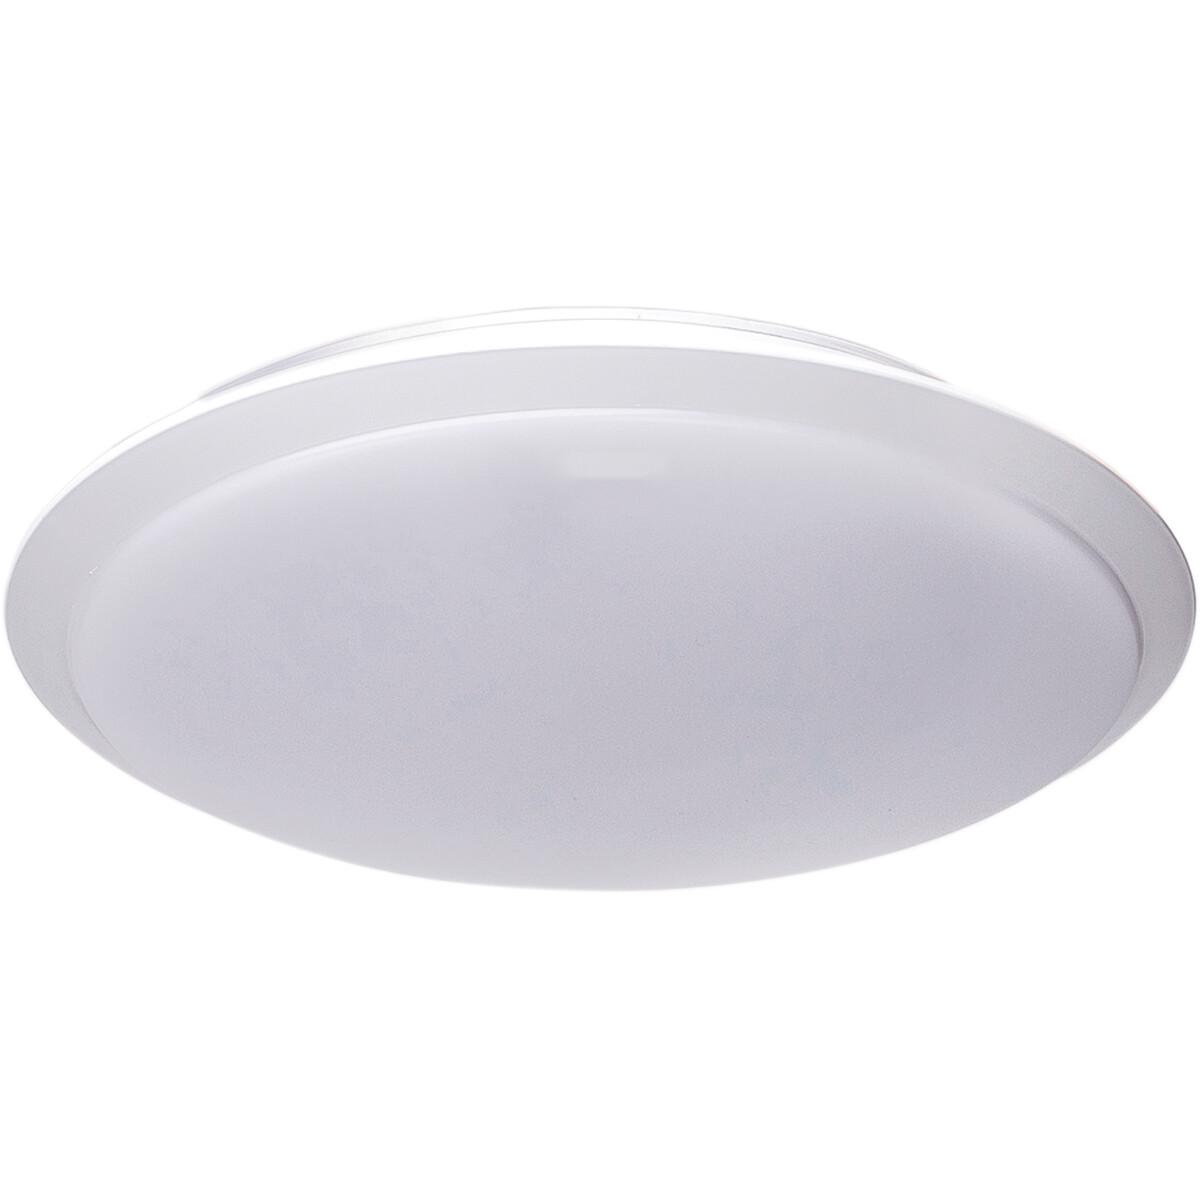 LED Plafondlamp - Aigi Ashly - Opbouw Rond 18W - Warm Wit 3000K - Mat Wit - Aluminium